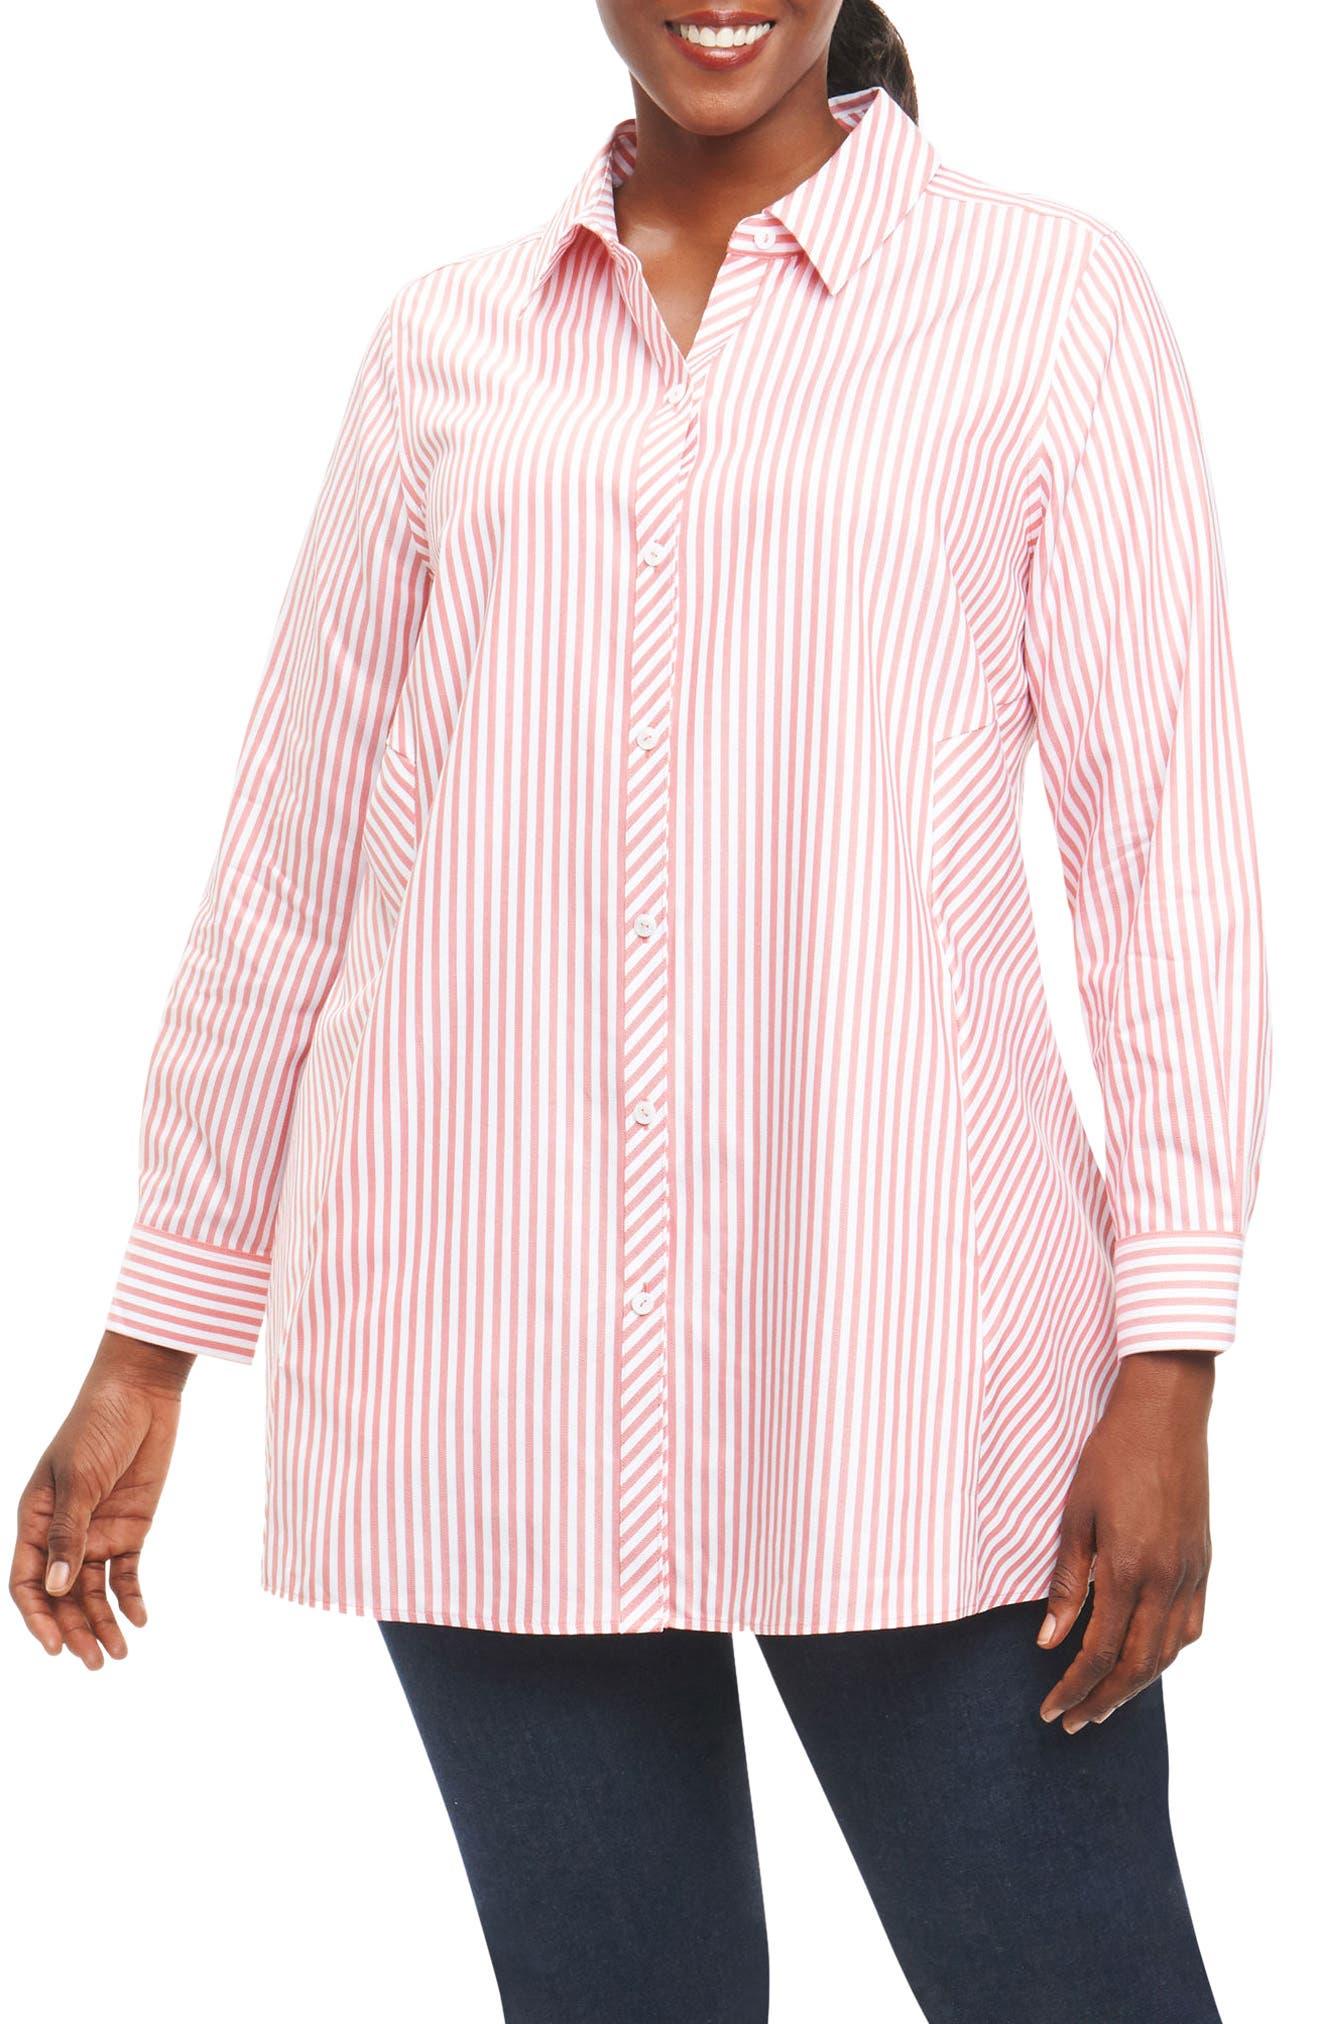 Foxcroft Cici Button Down Tunic Top (Plus Size)